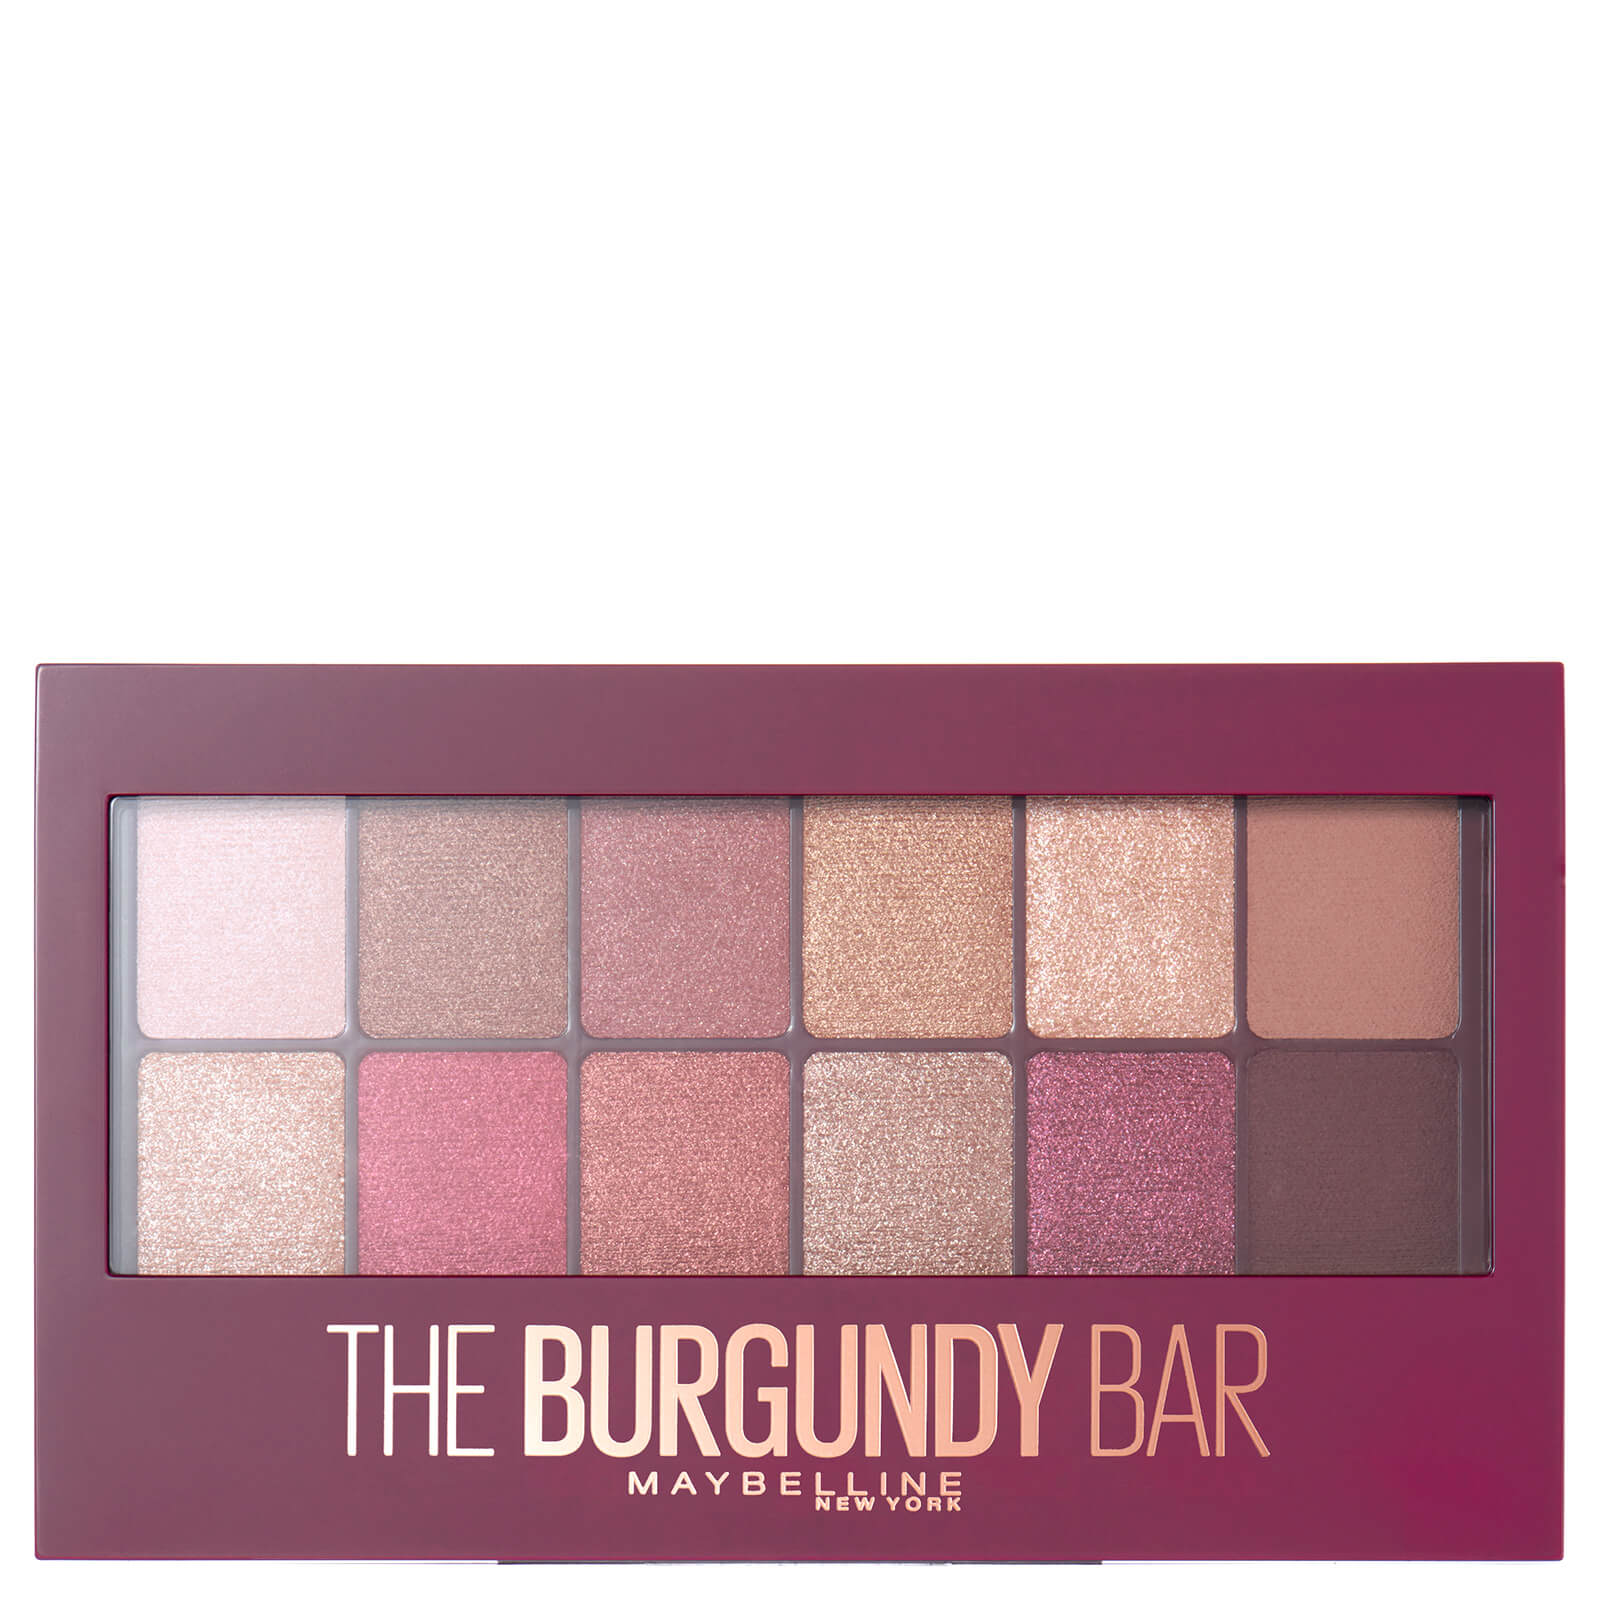 d43a167e791 Maybelline The Burgundy Bar Eyeshadow Palette (Worth £11.99) | Free  Shipping | Lookfantastic